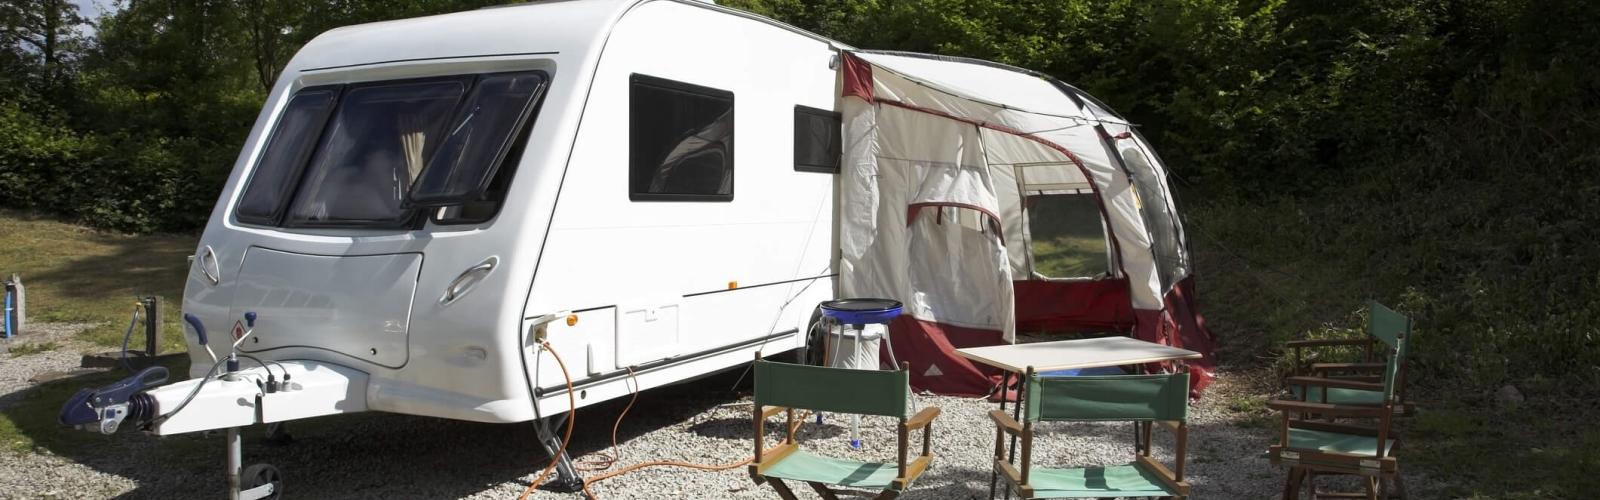 Caravan Services